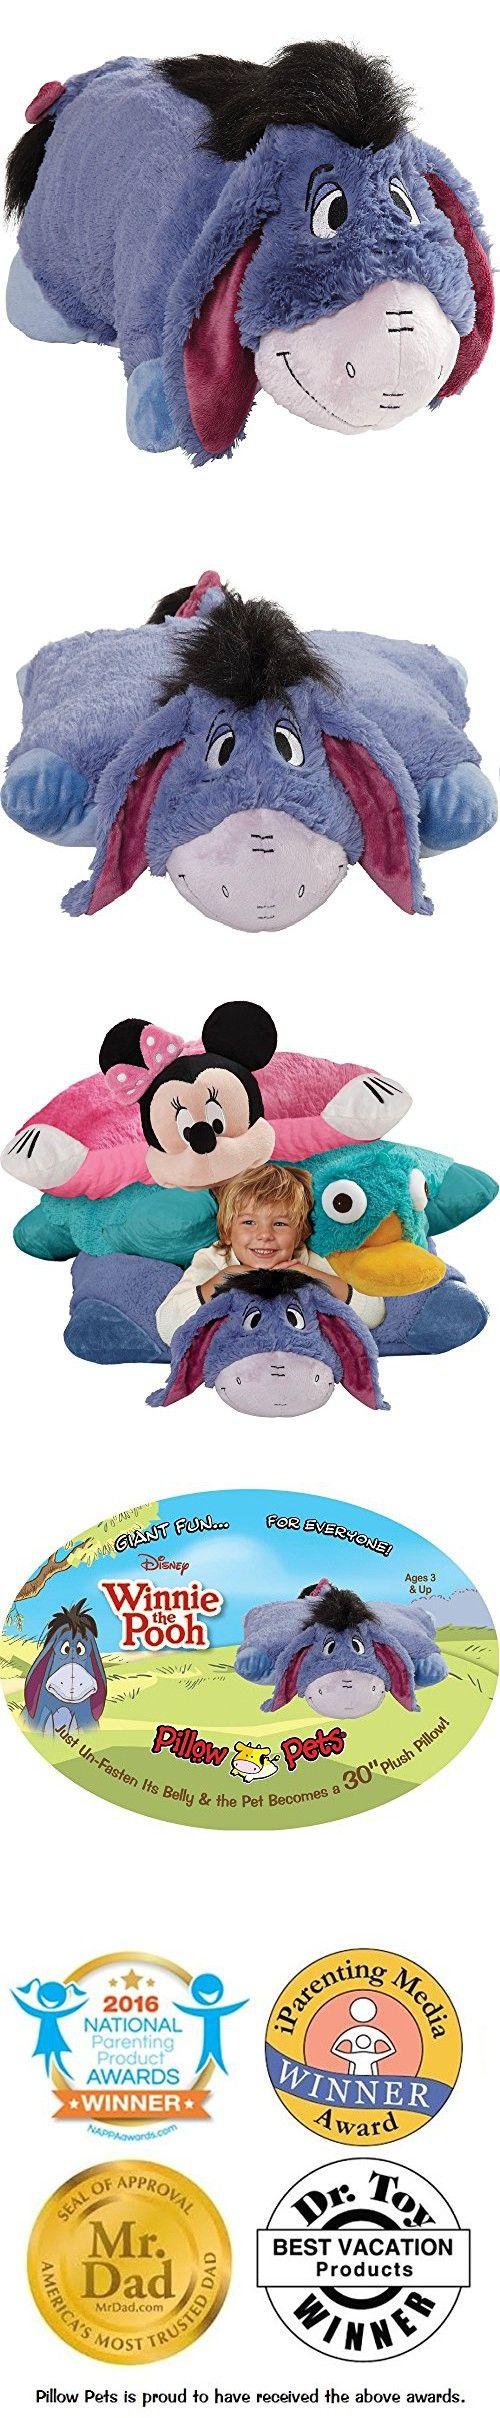 Pillow Pets Jumboz Disney Eeyore 30 Jumbo Folding Plush Pillow Animal Pillows Plush Pillows Oversized Stuffed Animals